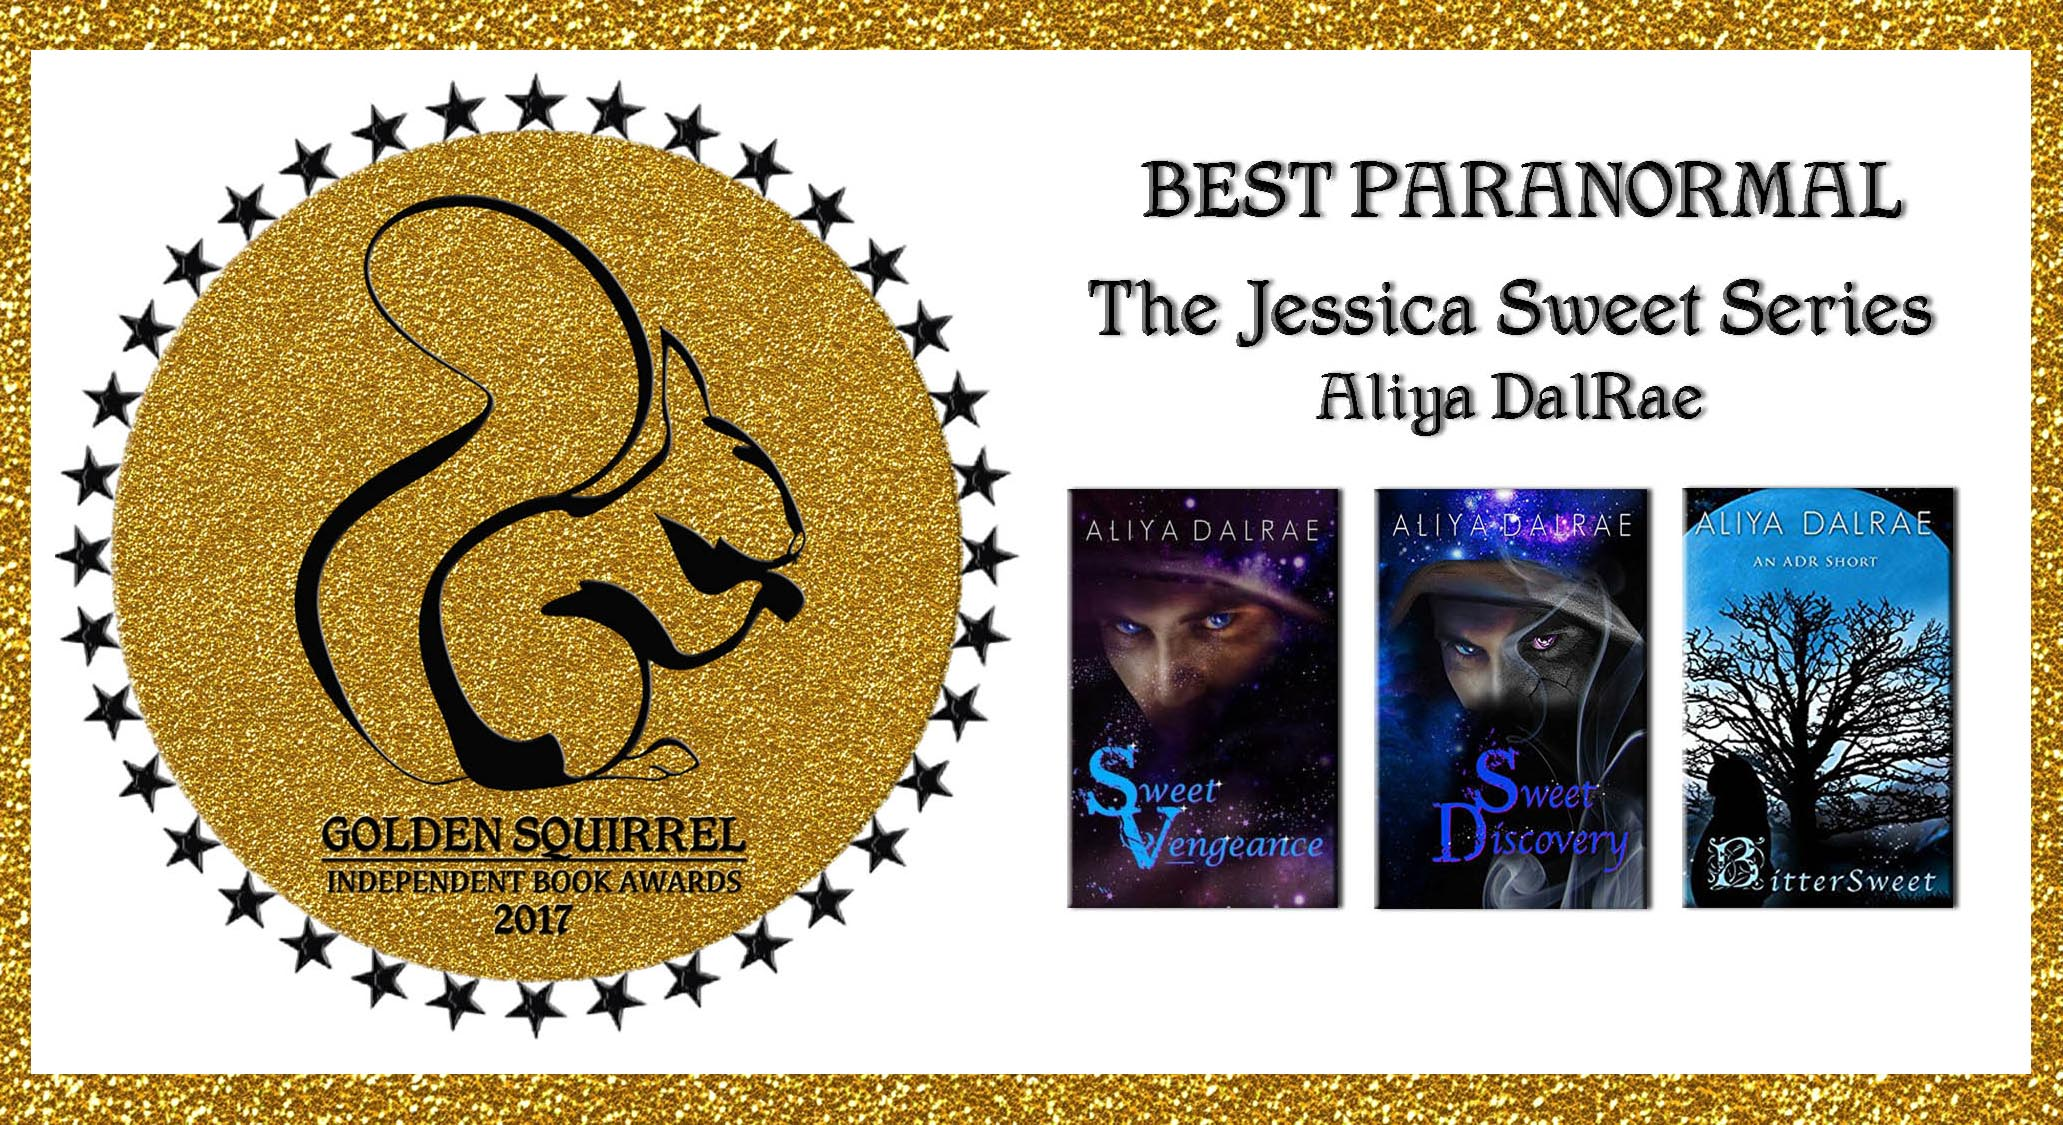 Golden Squirrel Best Paranormal